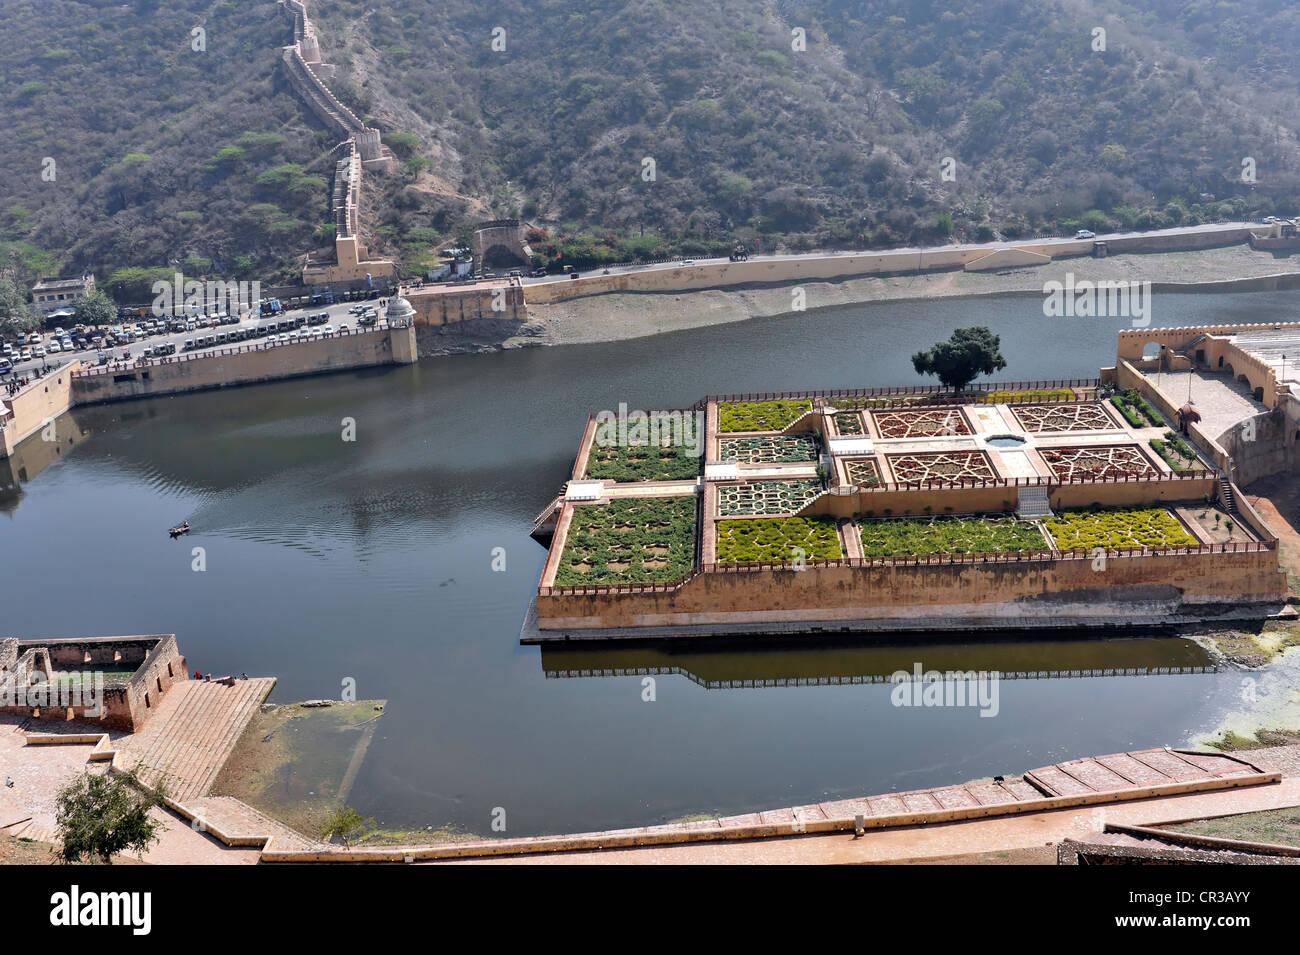 Kesar Kyari Bagh gardens, Fort Amber, Amber, near Jaipur, Rajasthan, North India, India, South Asia, Asia - Stock Image